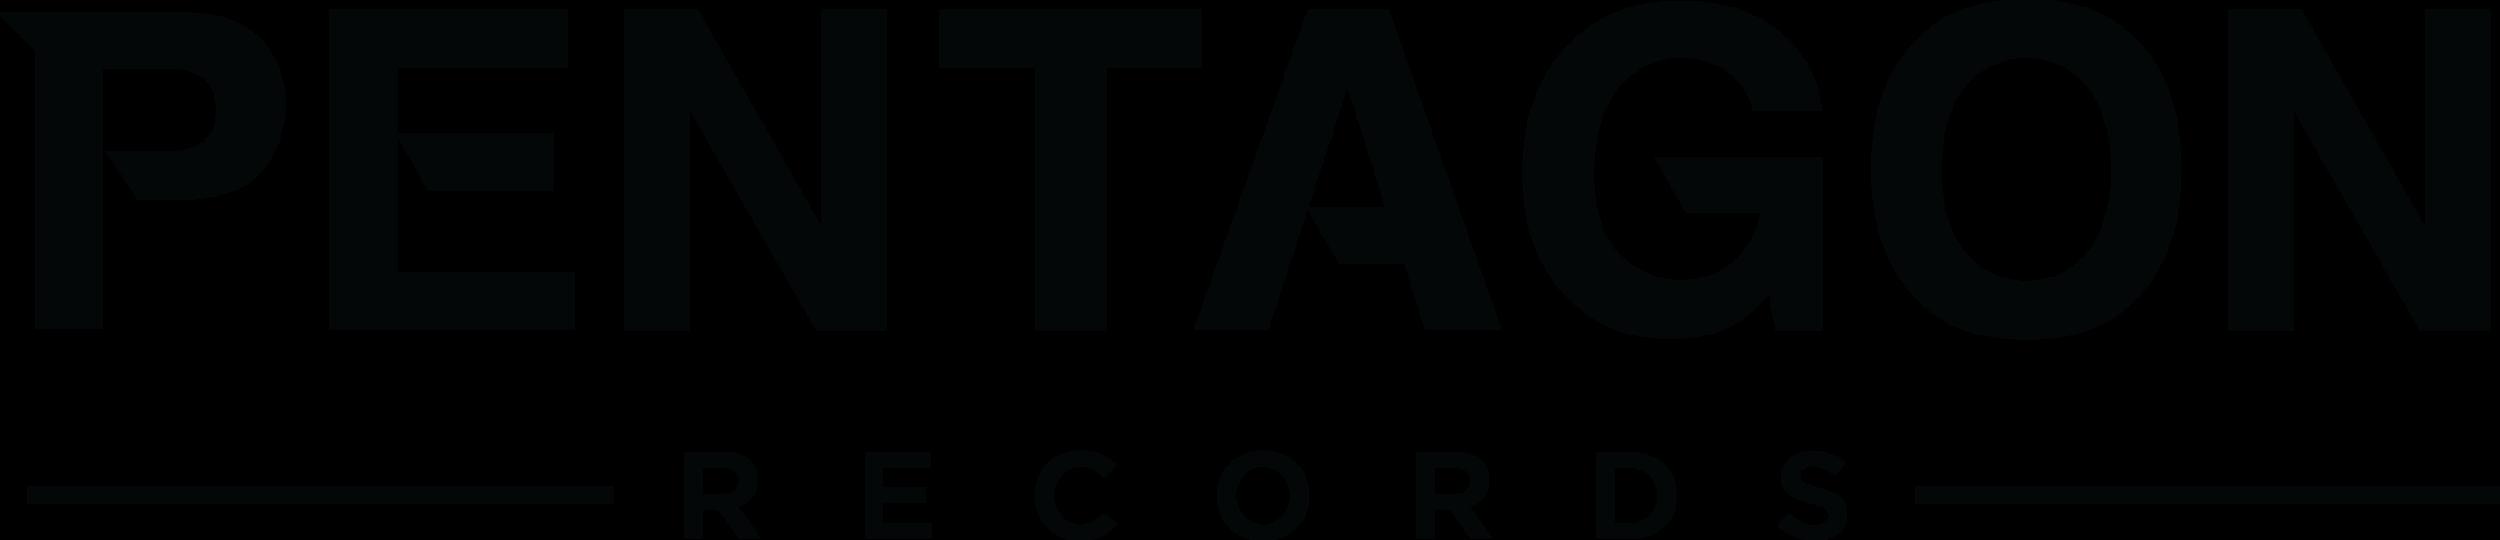 Pentagon Records.png